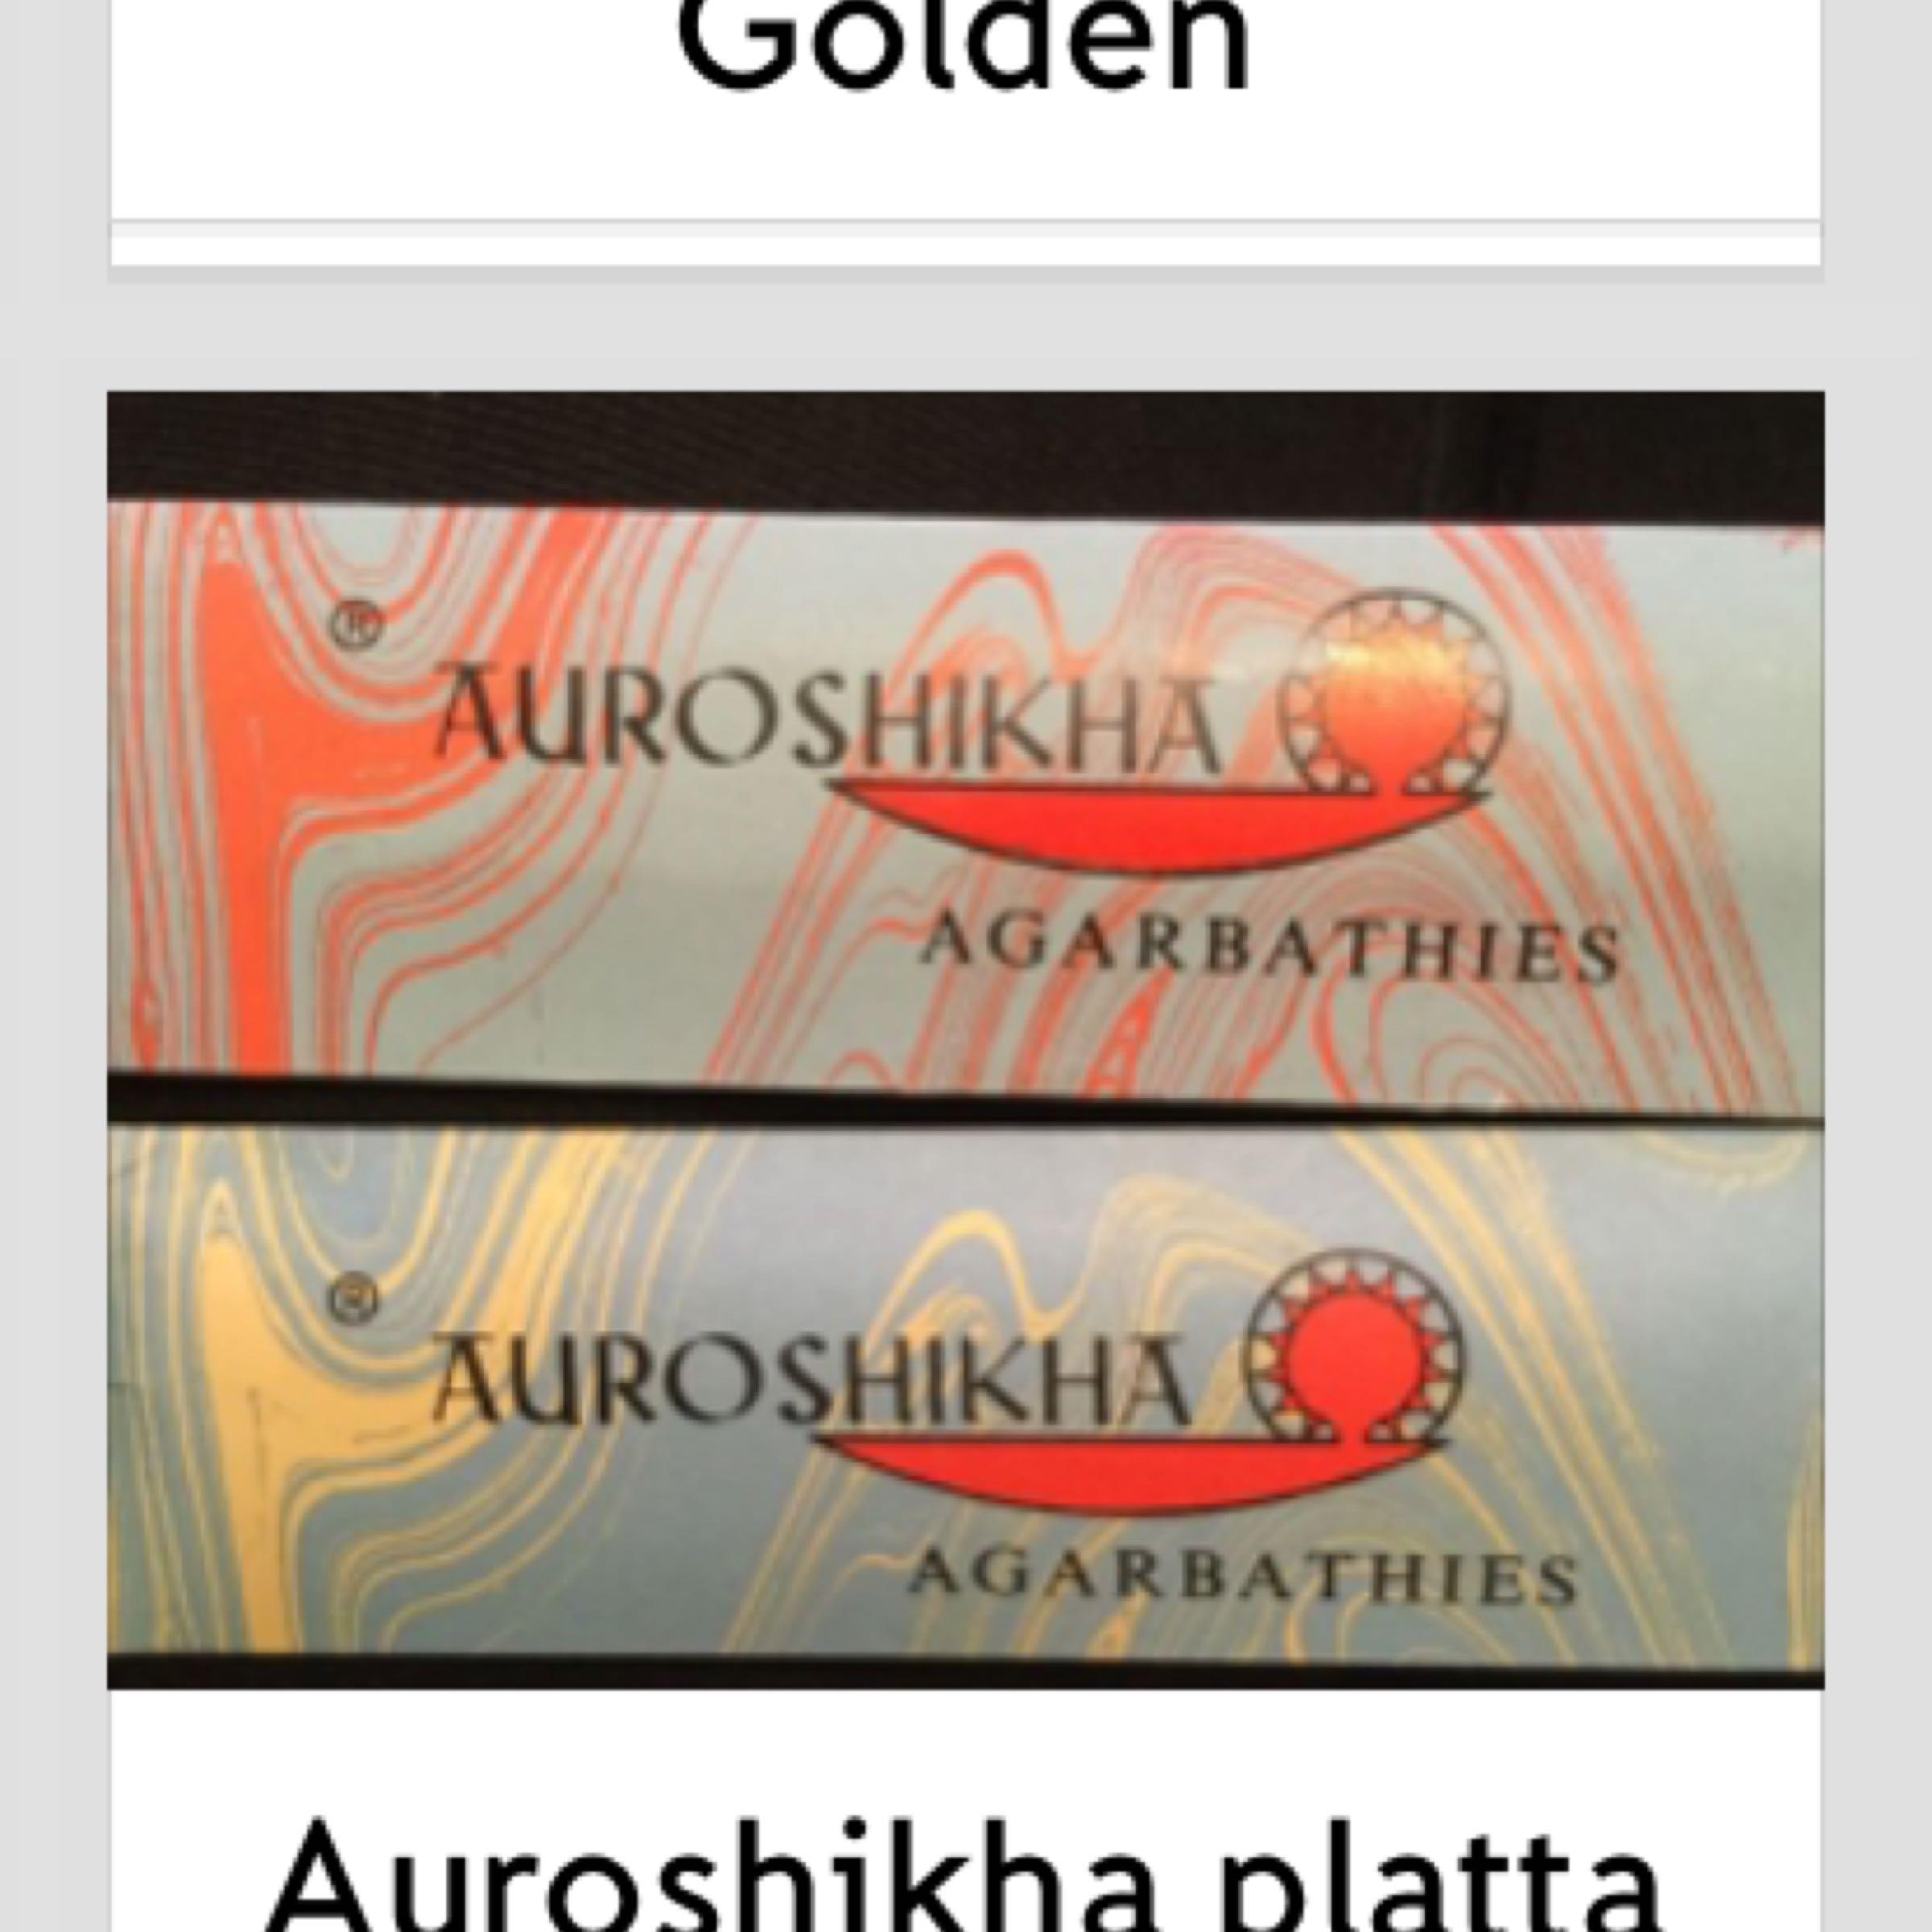 Auroshikha platta 15:-